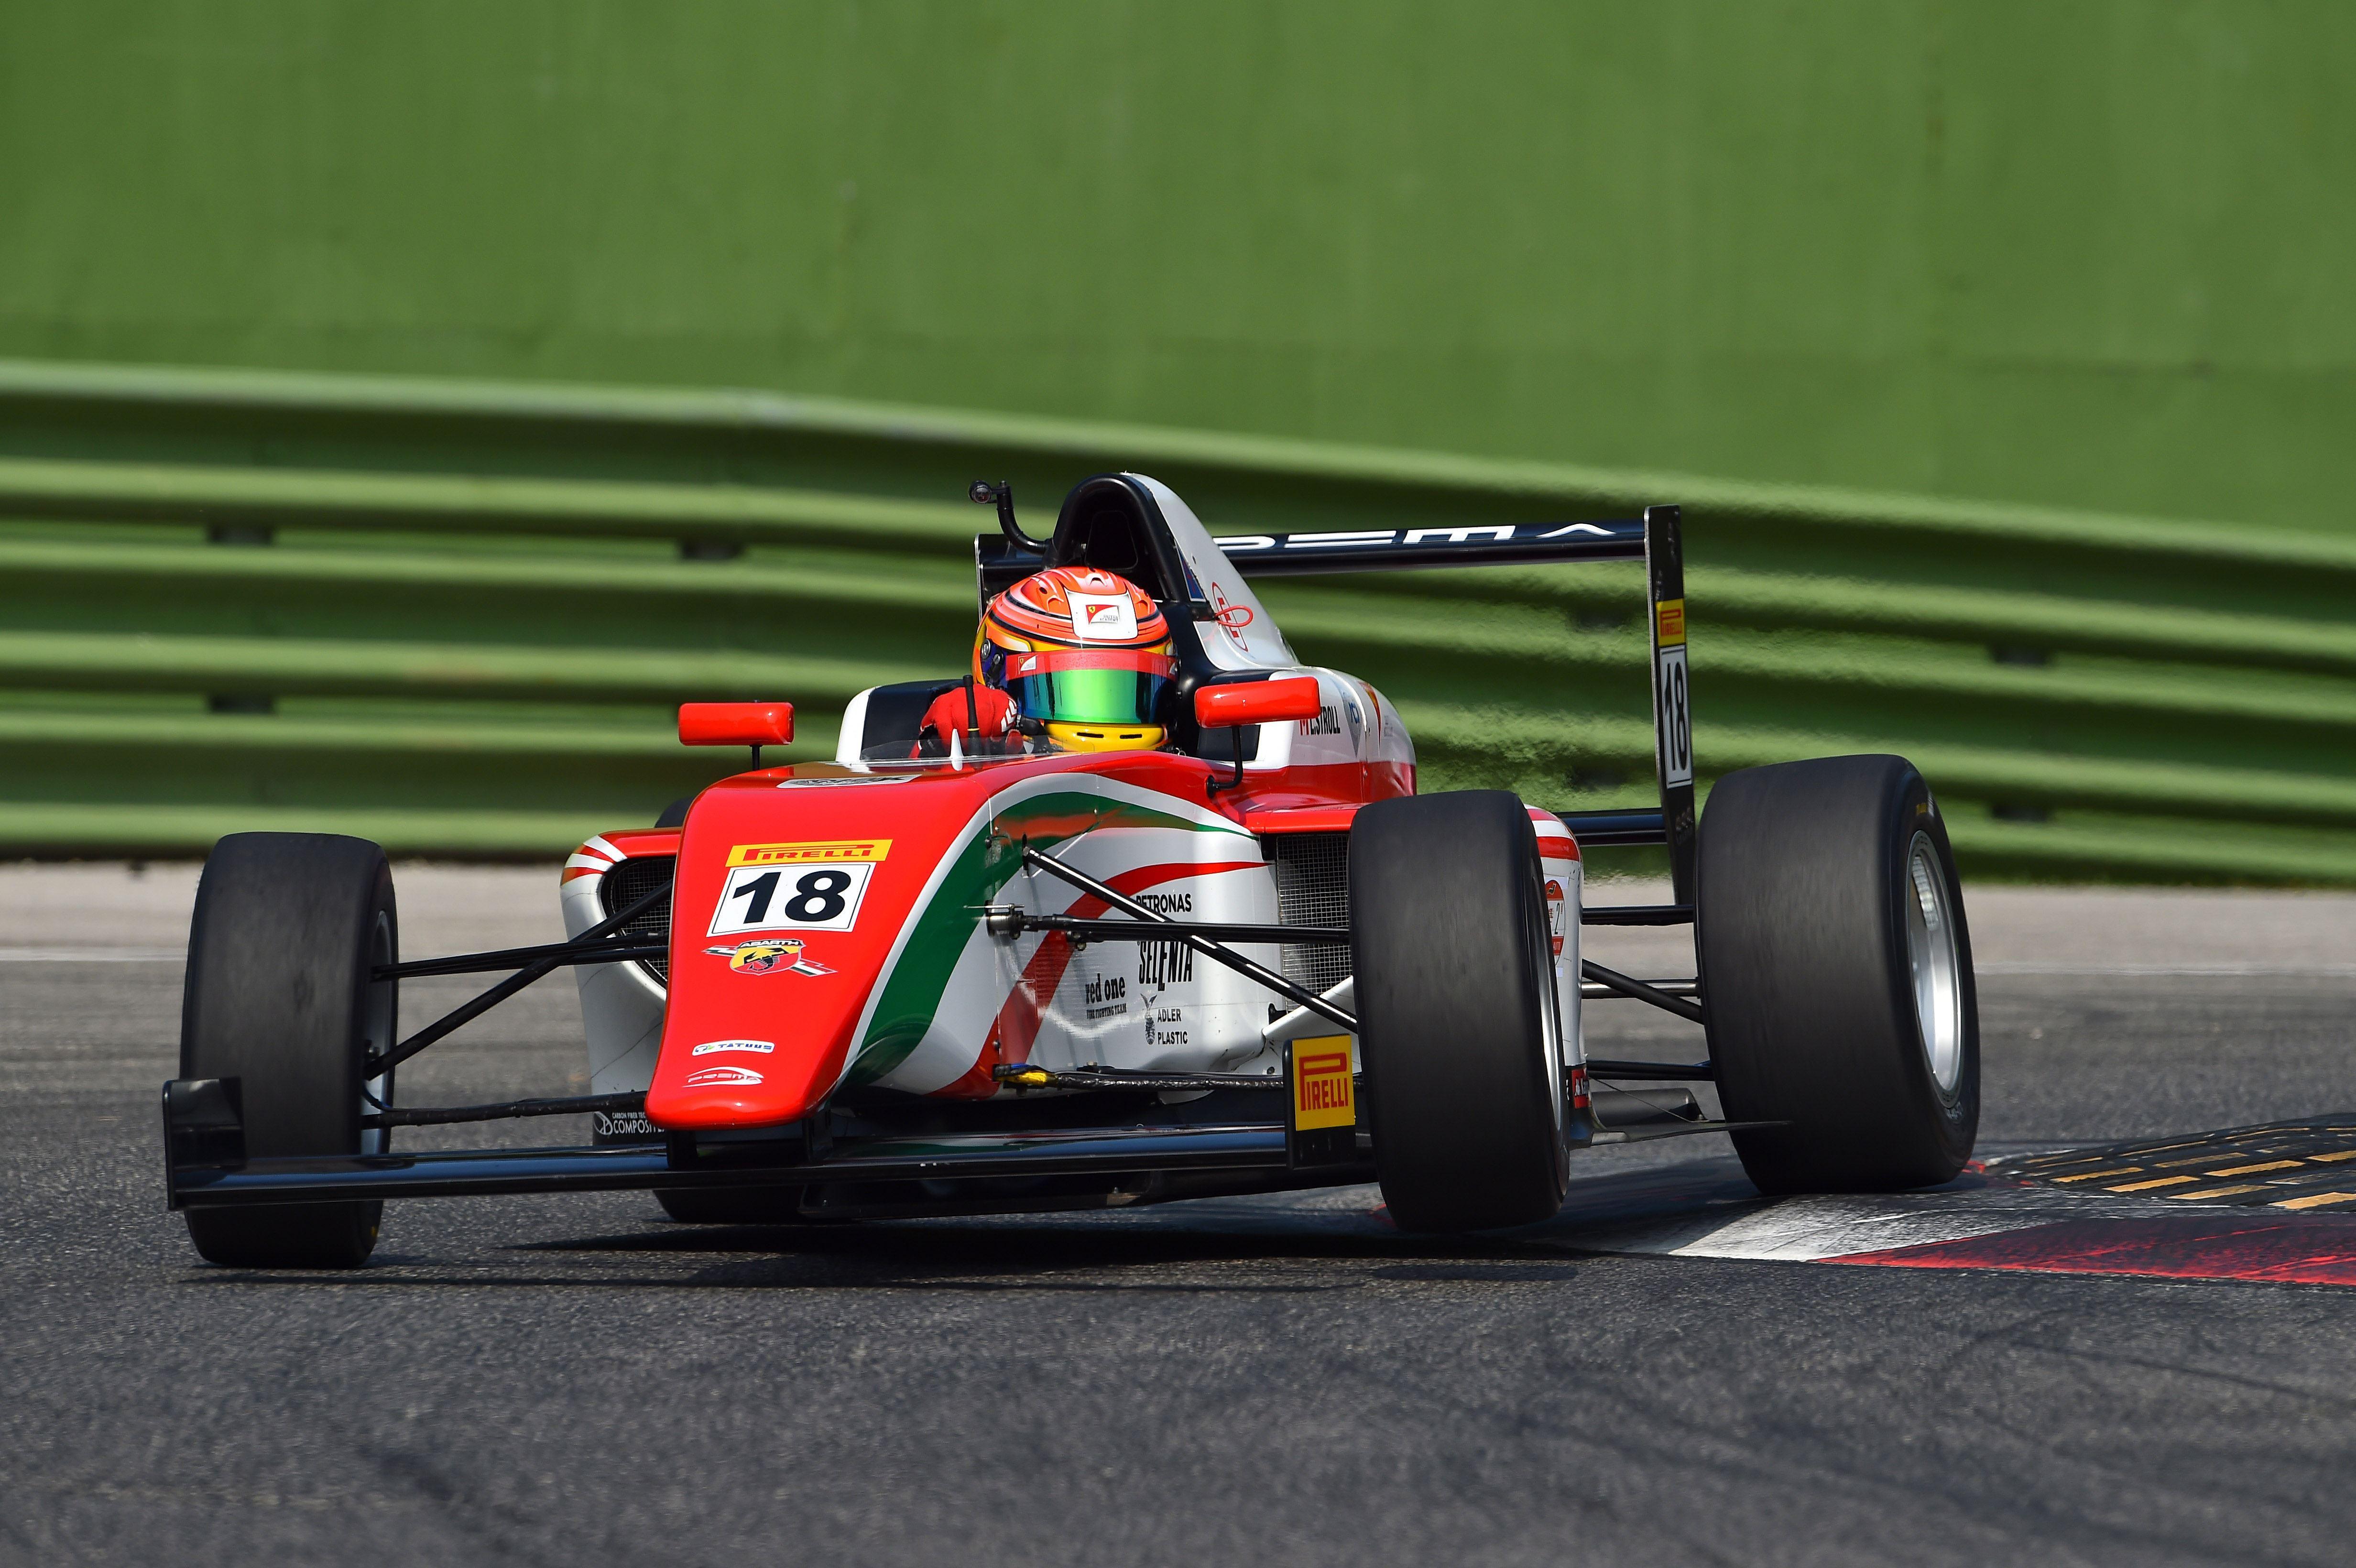 Lance Stroll Prema Powerteam Italian F4 2014 Imola 4928 3280 F1feederseries